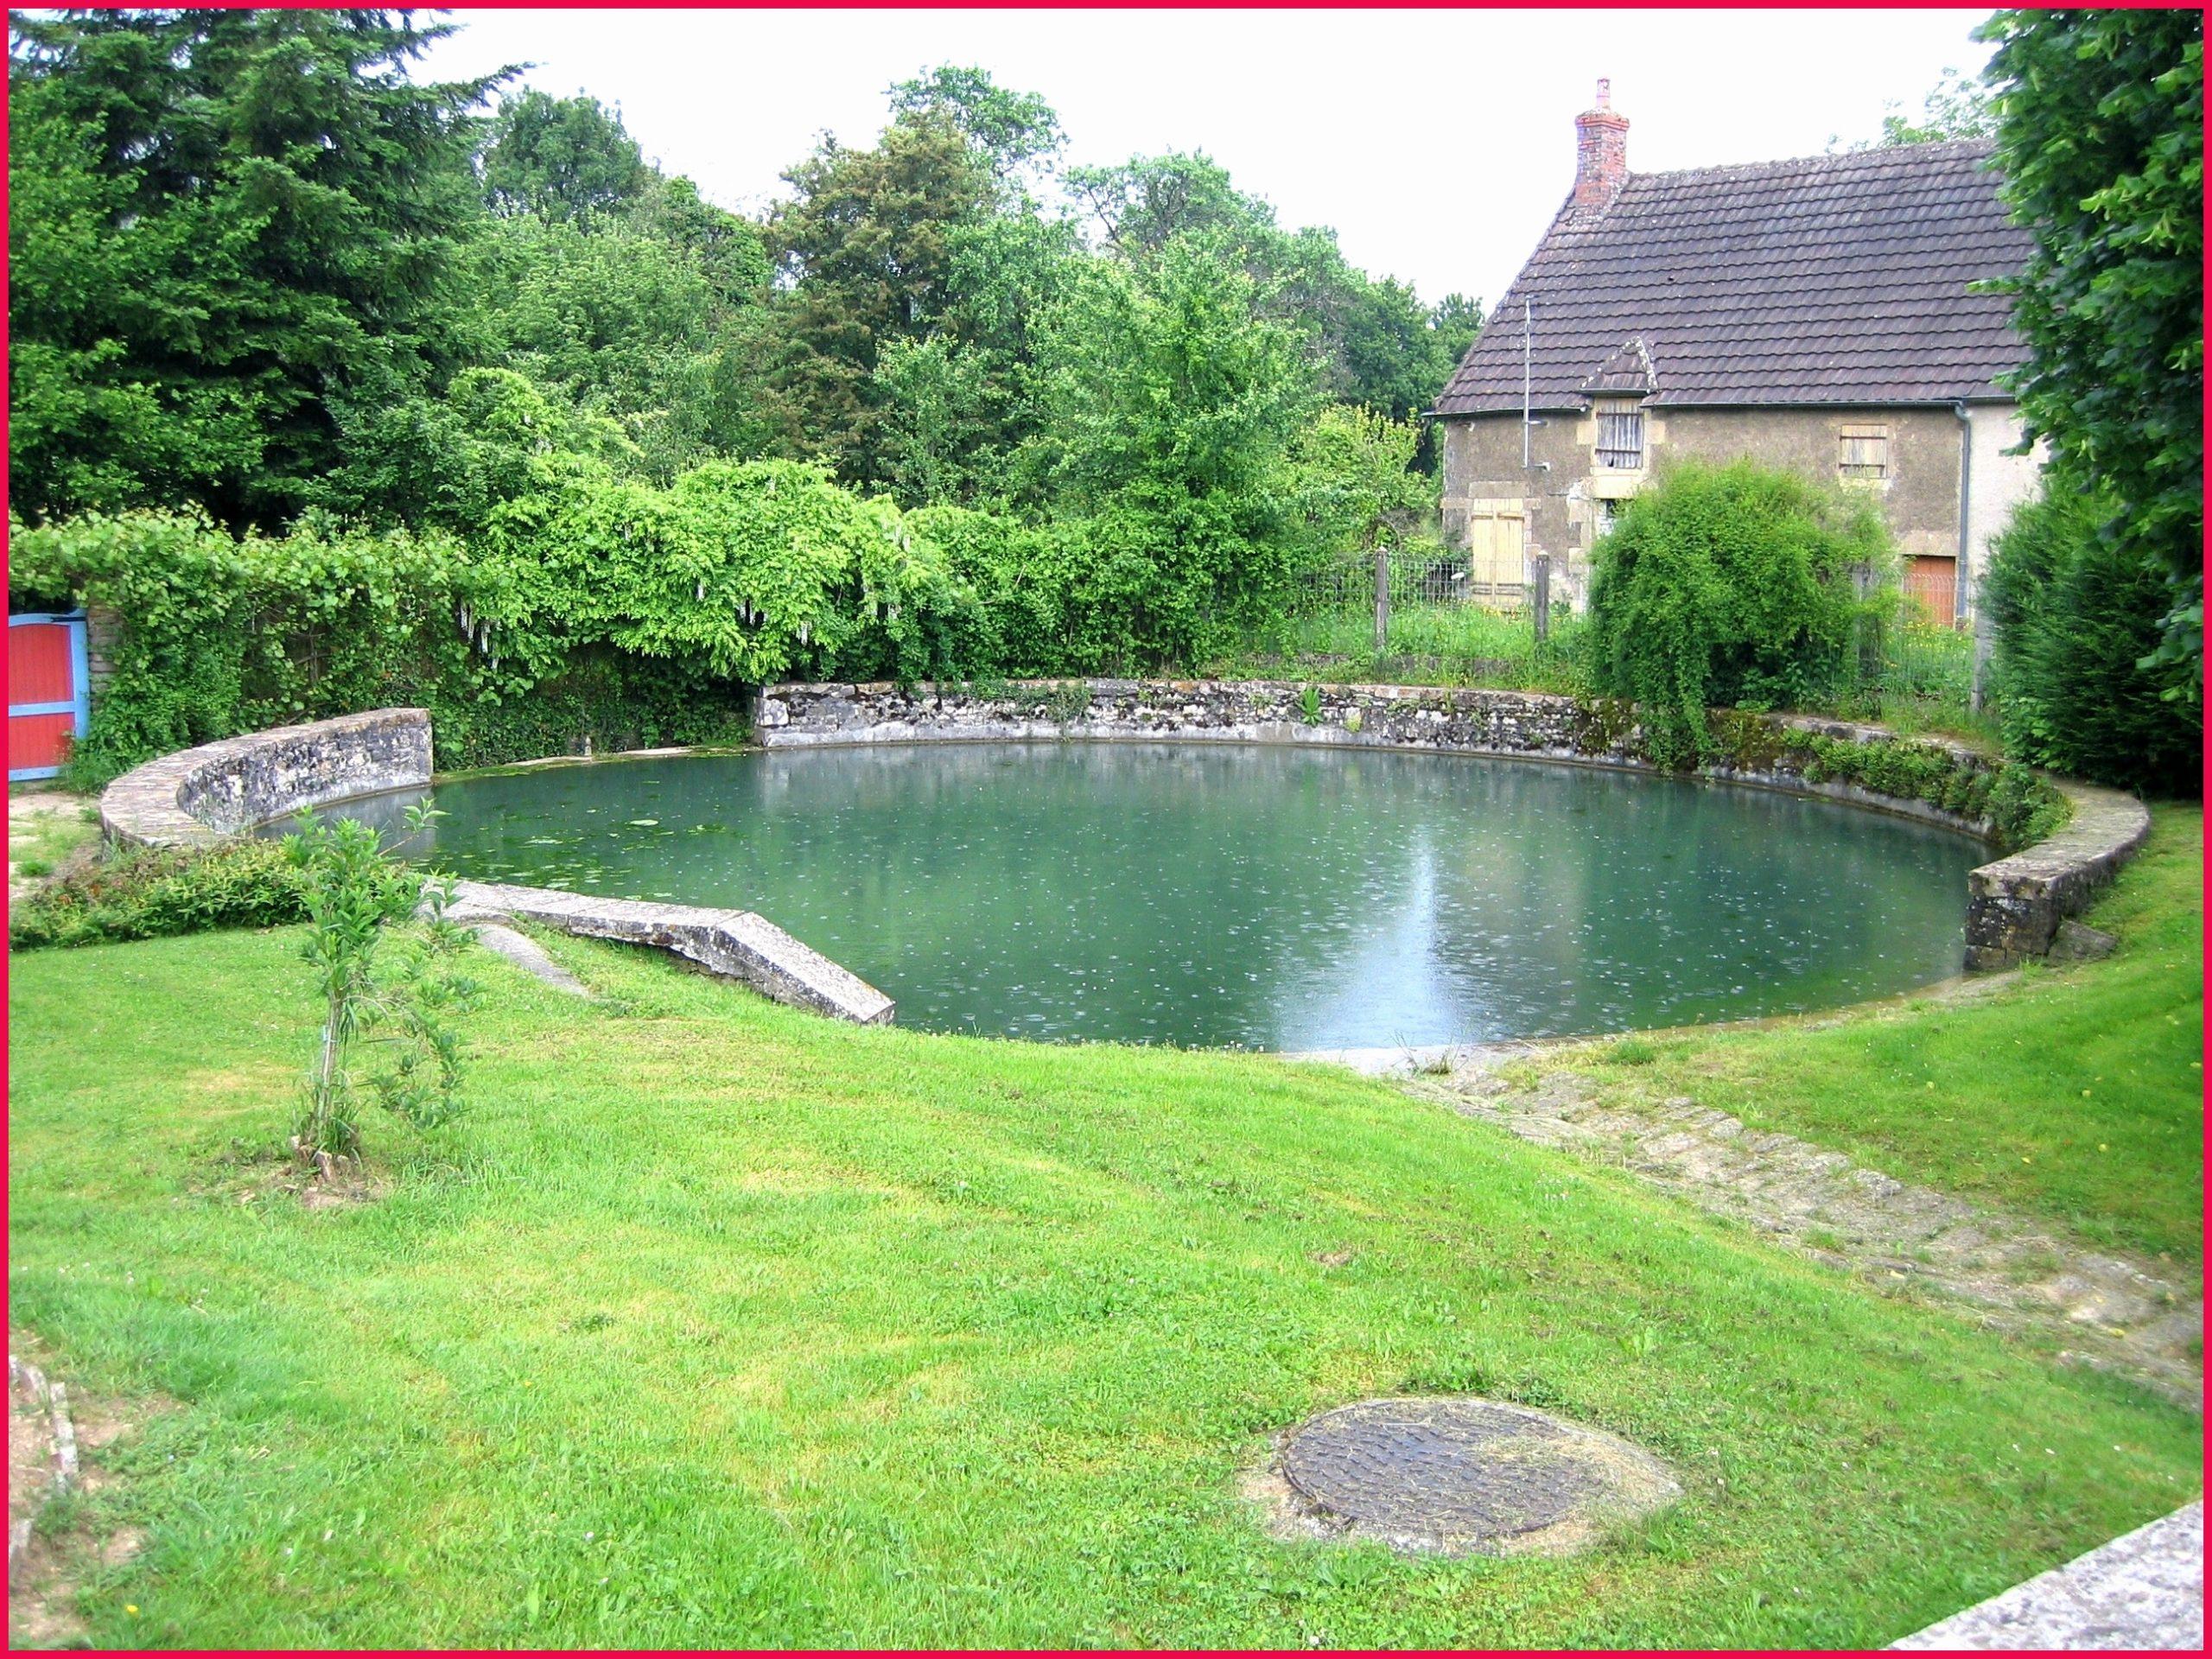 Pompe De Bassin Jardiland With Destiné À Bassin De Jardin ... pour Bassin De Jardin Préformé Grande Taille